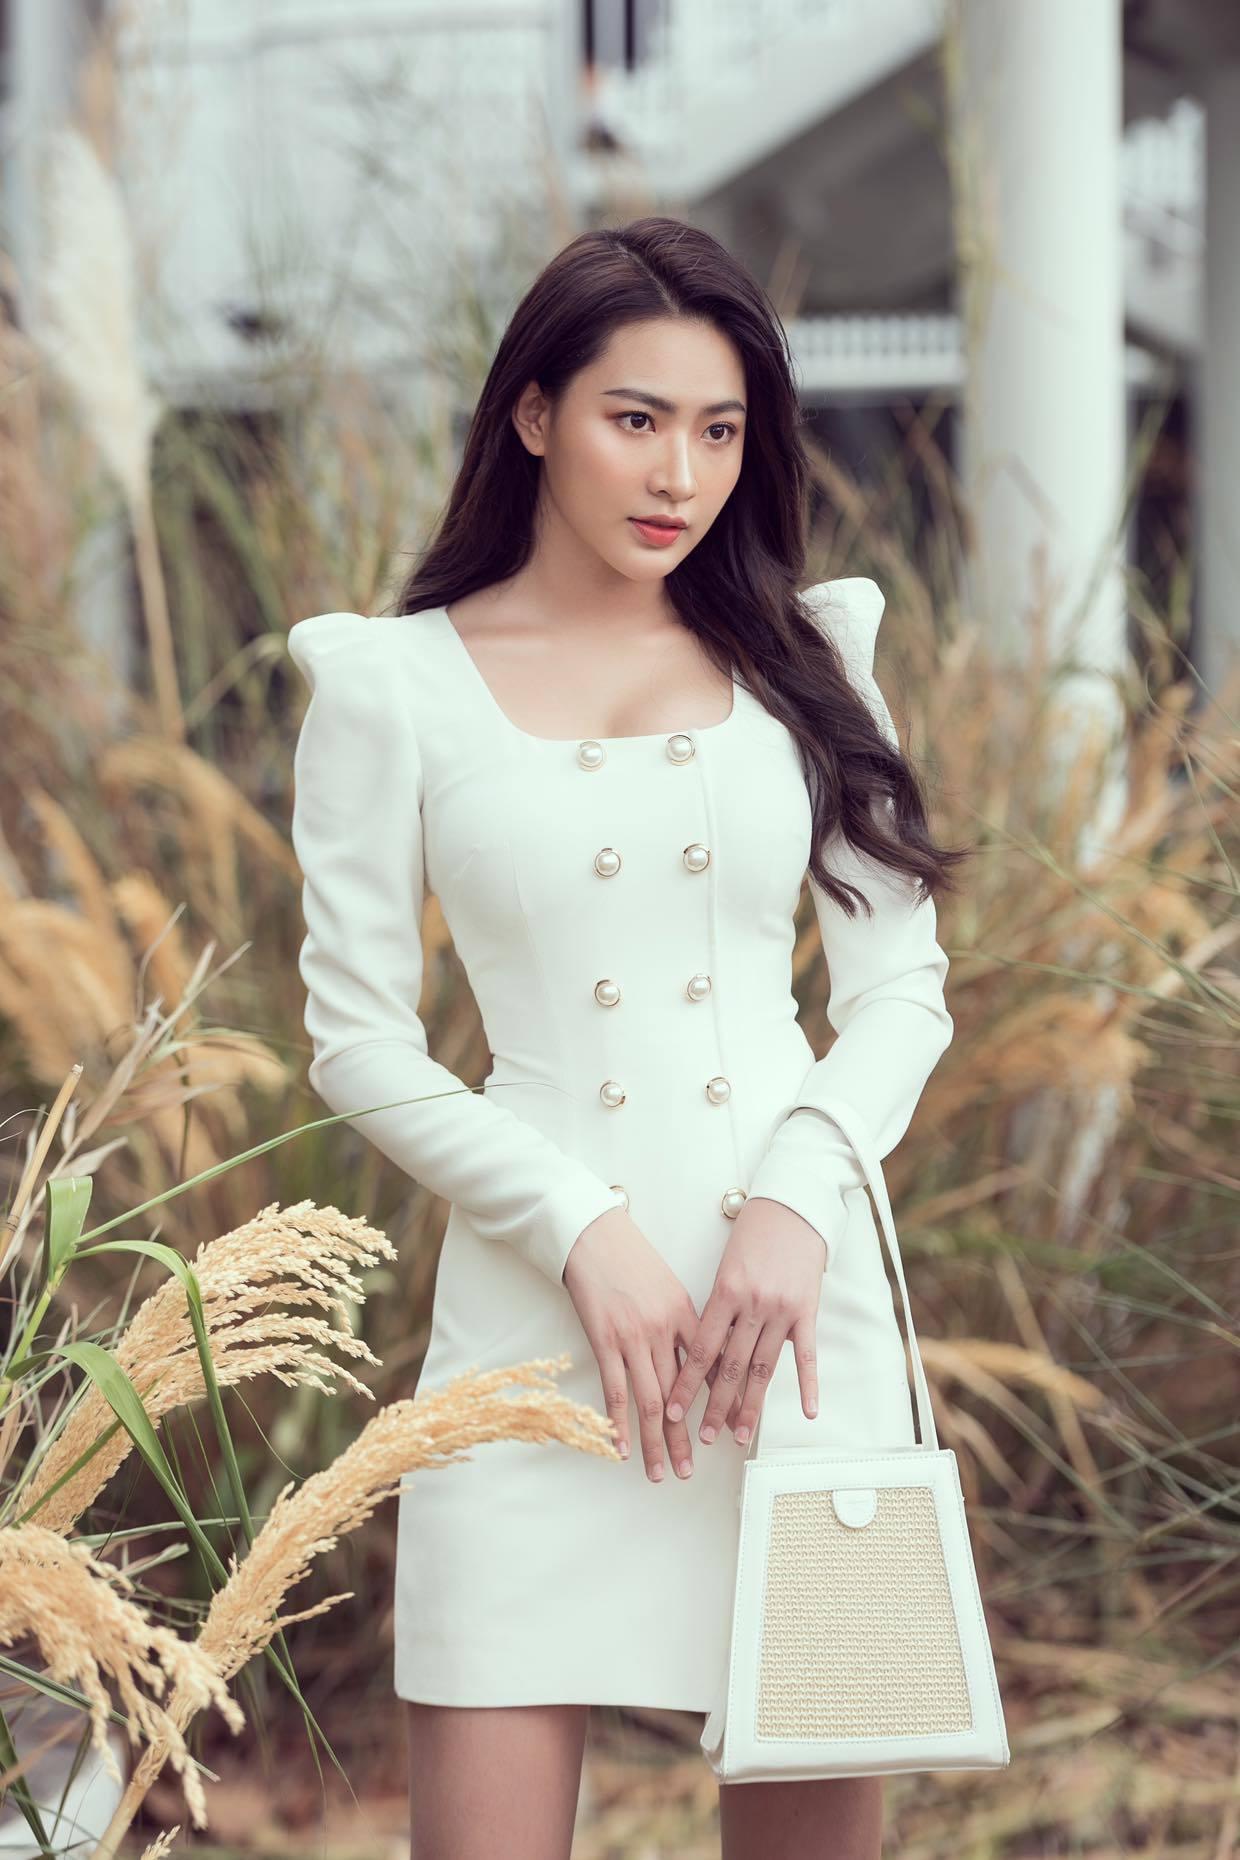 Baifern Pimchanok,Nguyễn Minh Trang